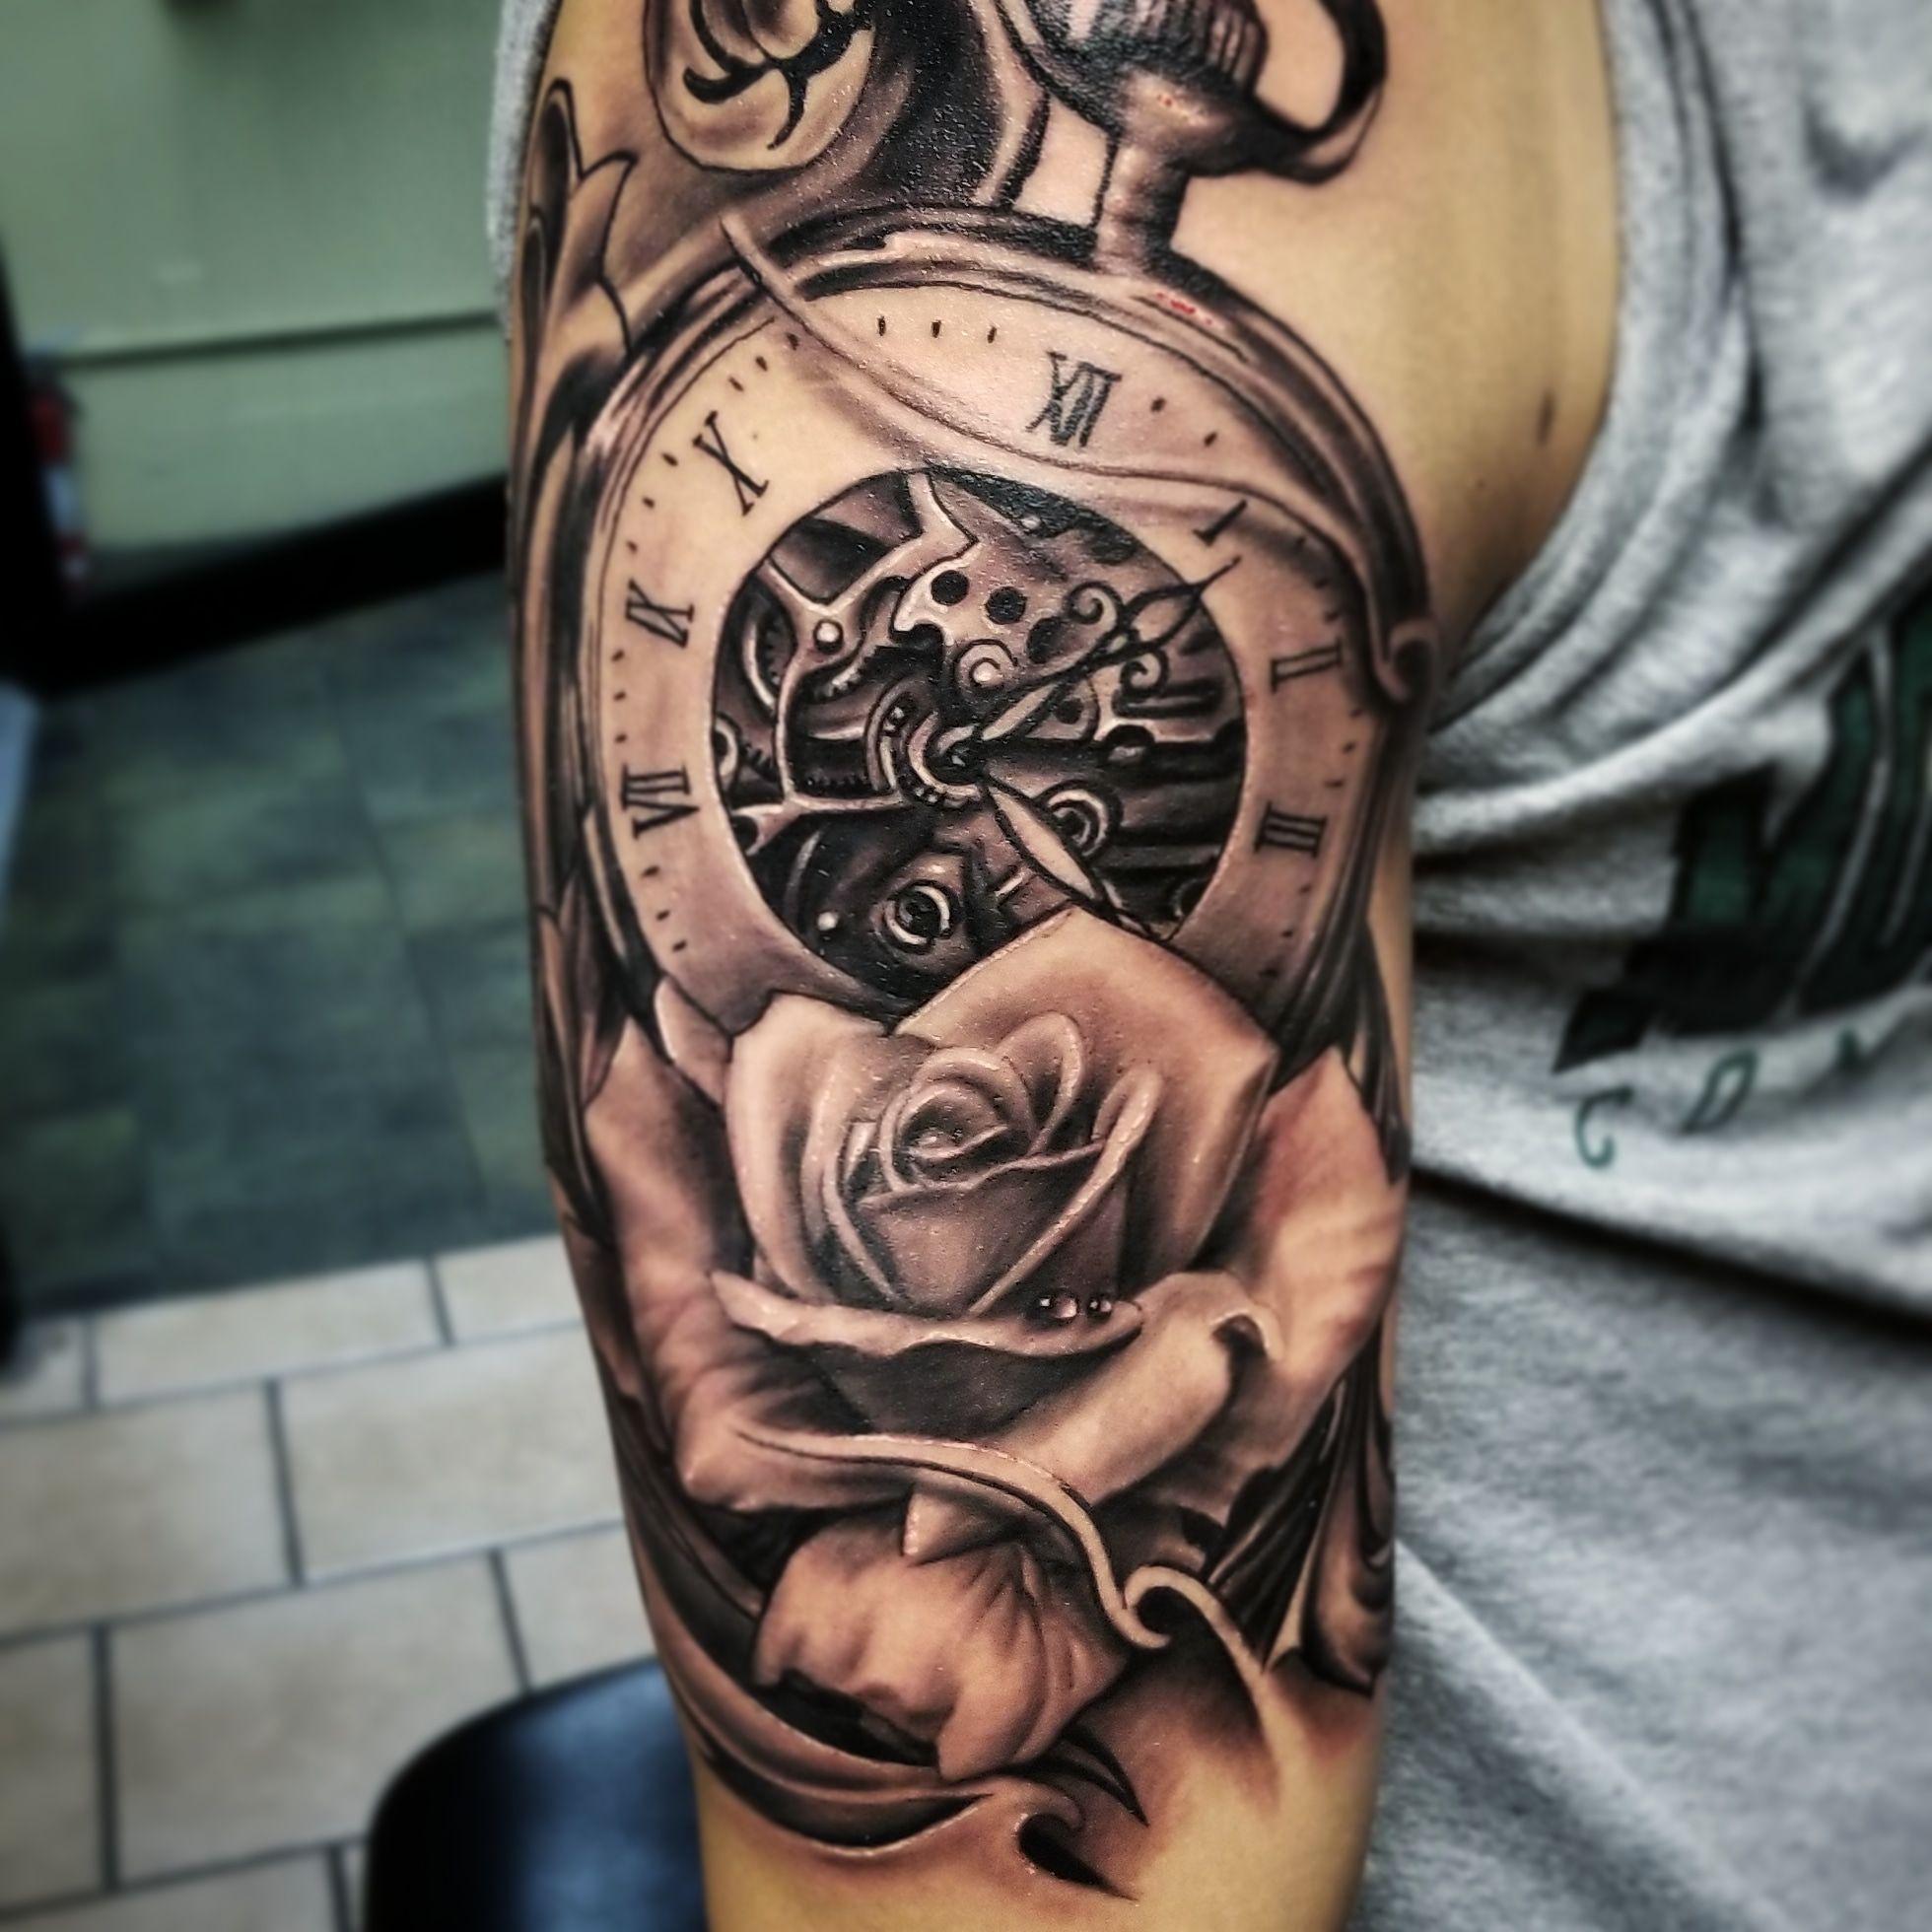 Ian Johnson Tattoos By Ian Tattoo Chicago Chicago Tattoo Artist Aztekink Victory Tattoo Harvey Matteson Il Black Tattoos Victory Tattoo Chicago Tattoo